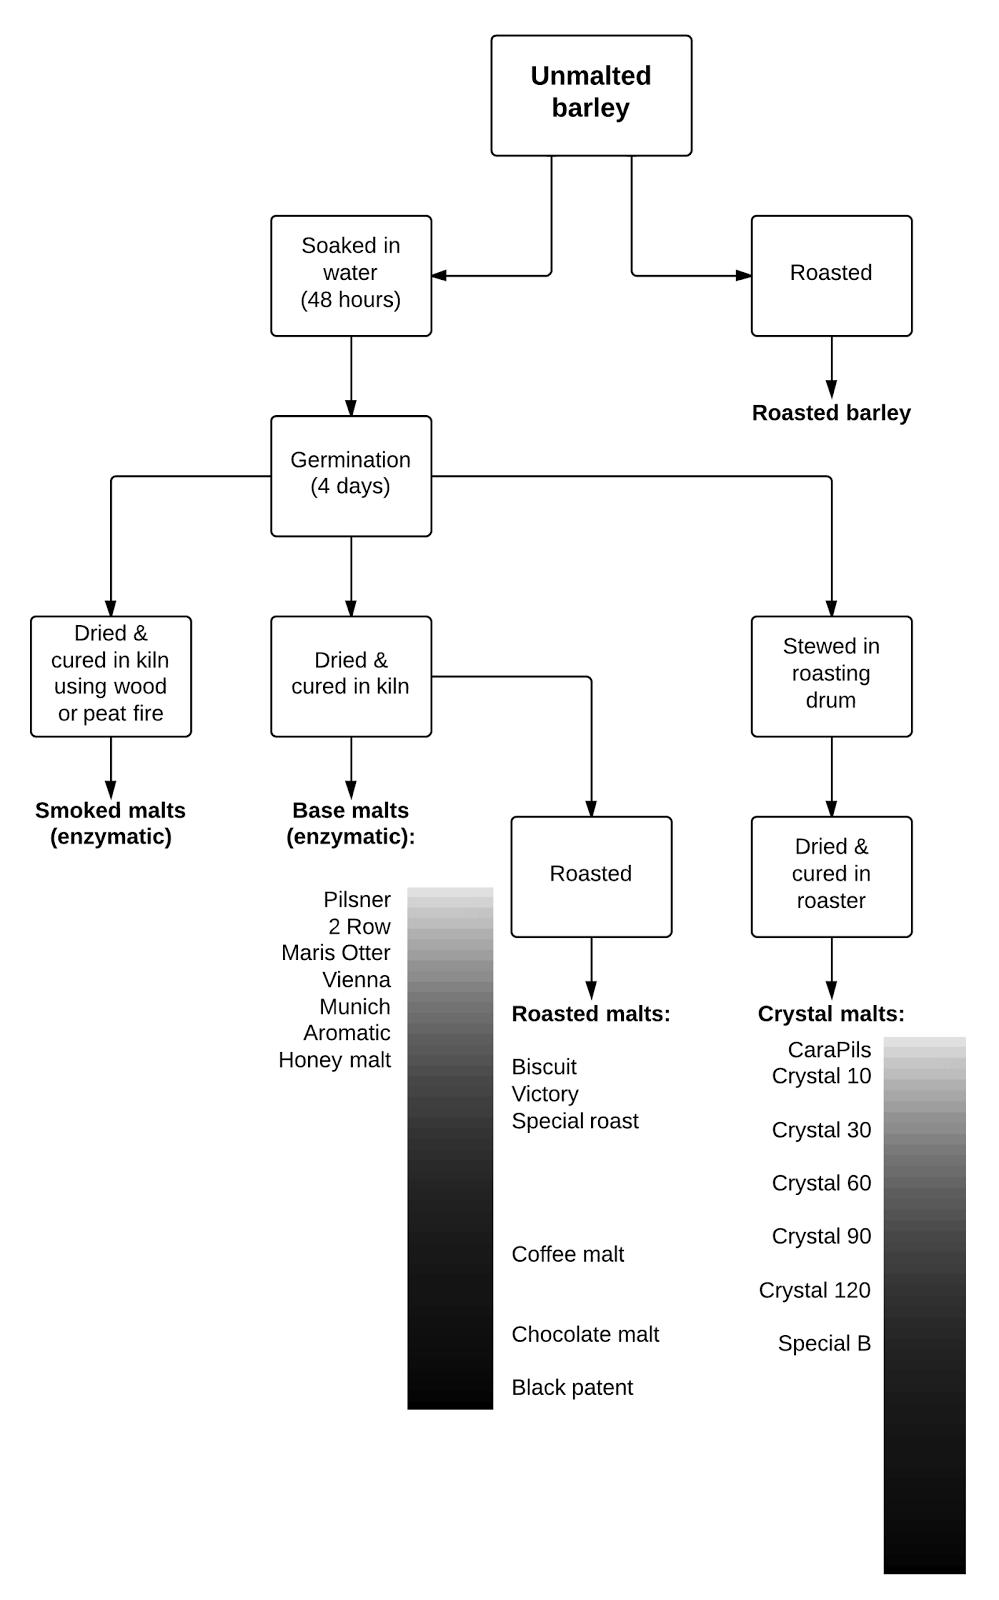 how to turn barley into malt